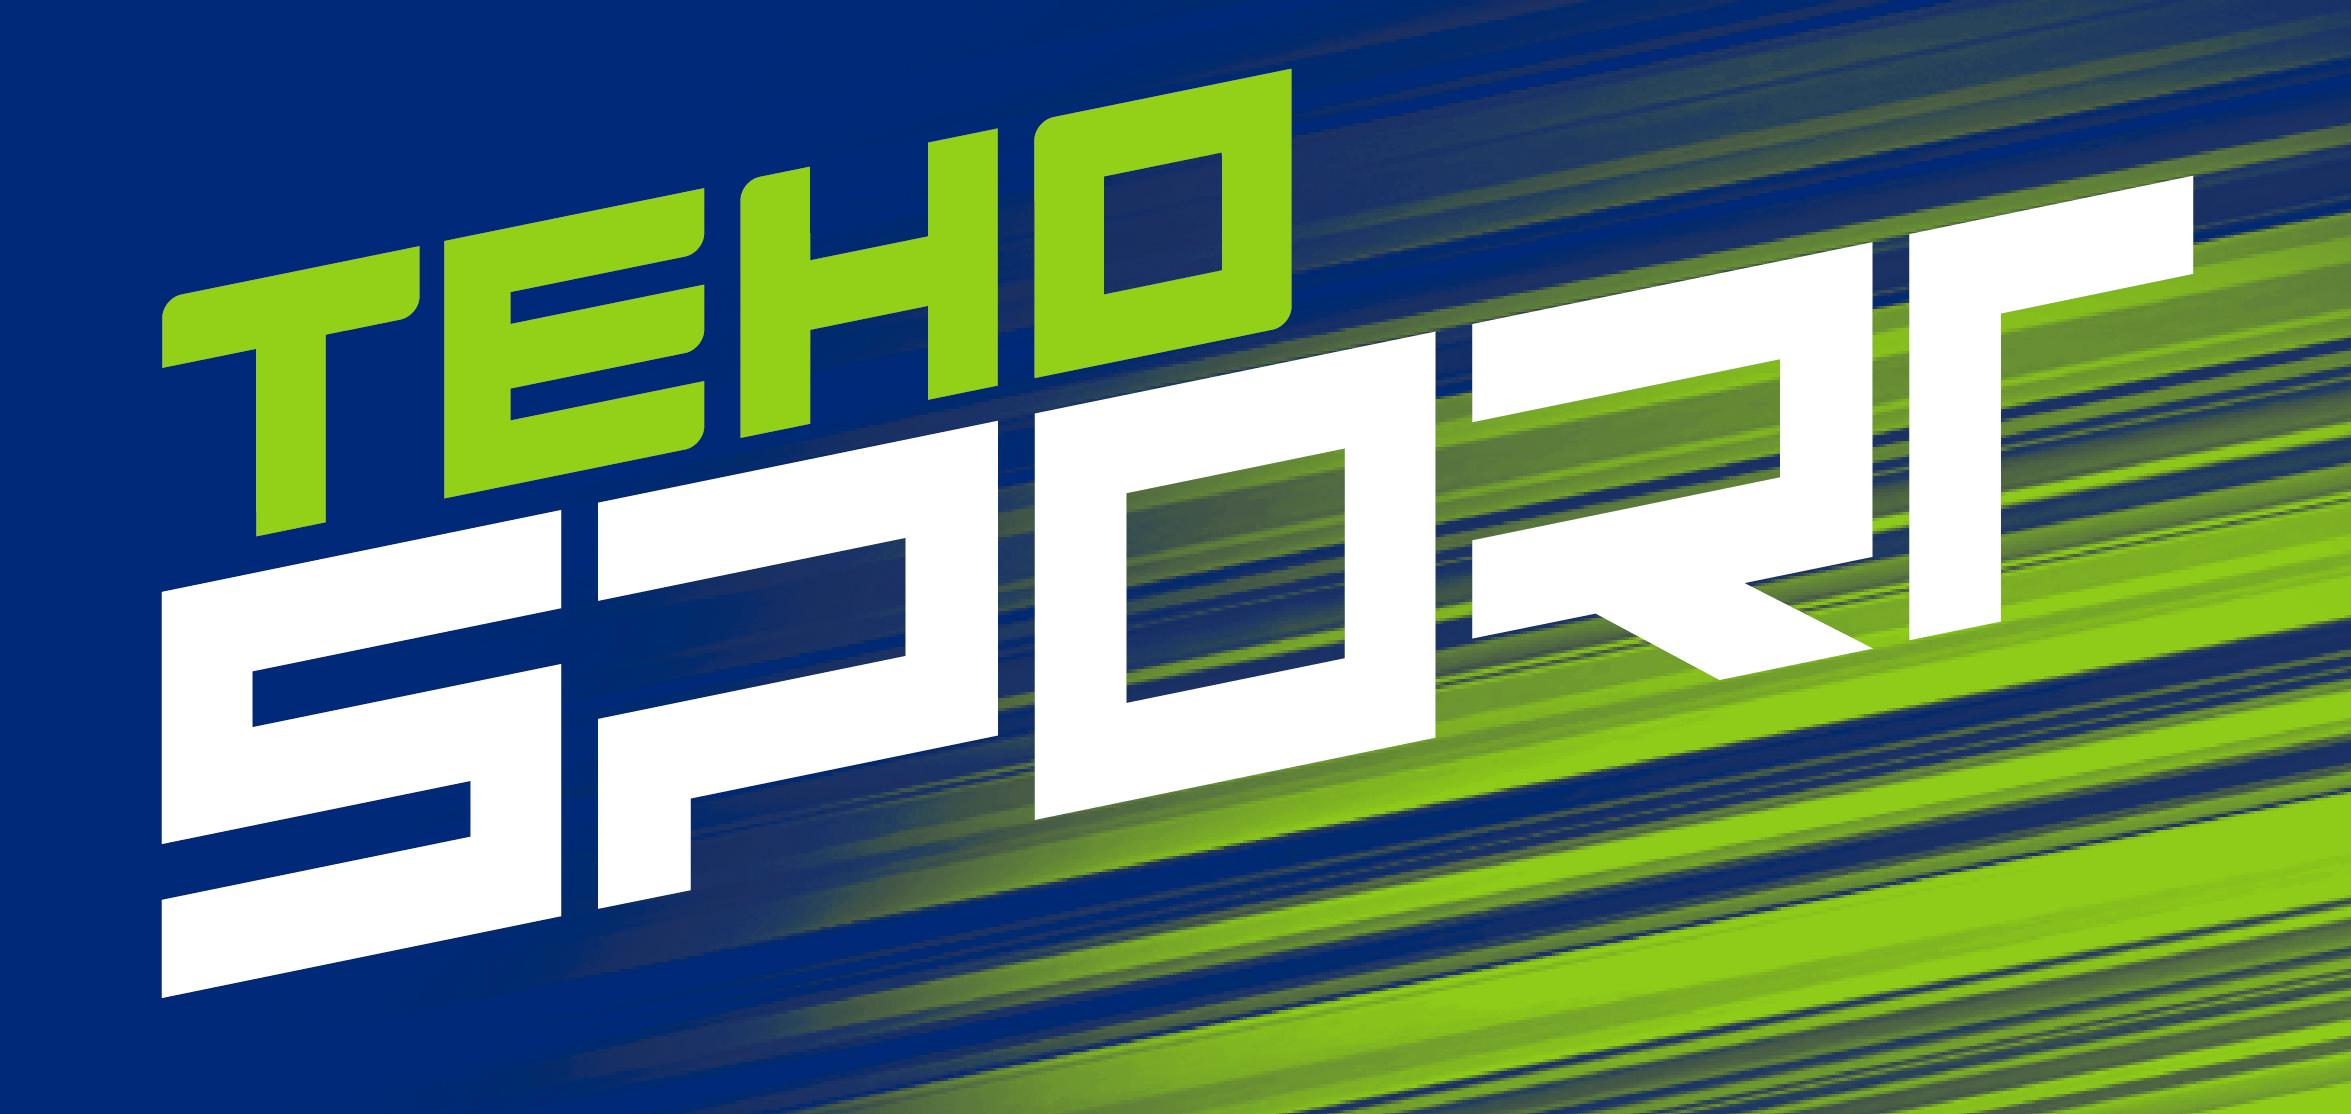 Teho_Sport_logo_BG_RGB (2)_6506